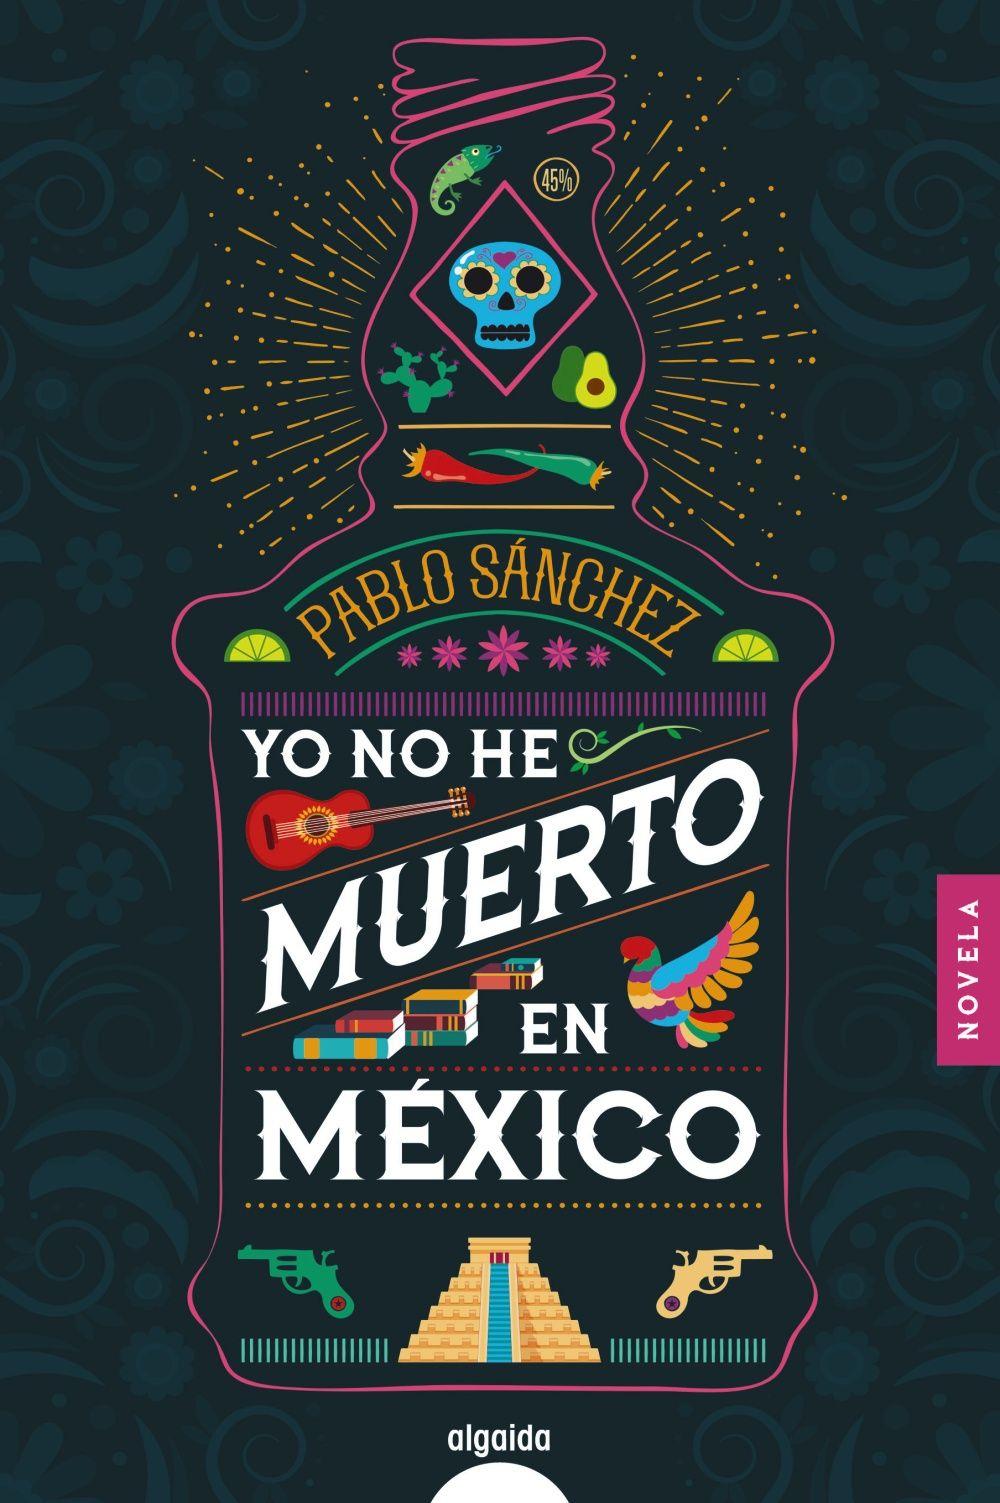 YO NO HE MUERTO EN MEXICO